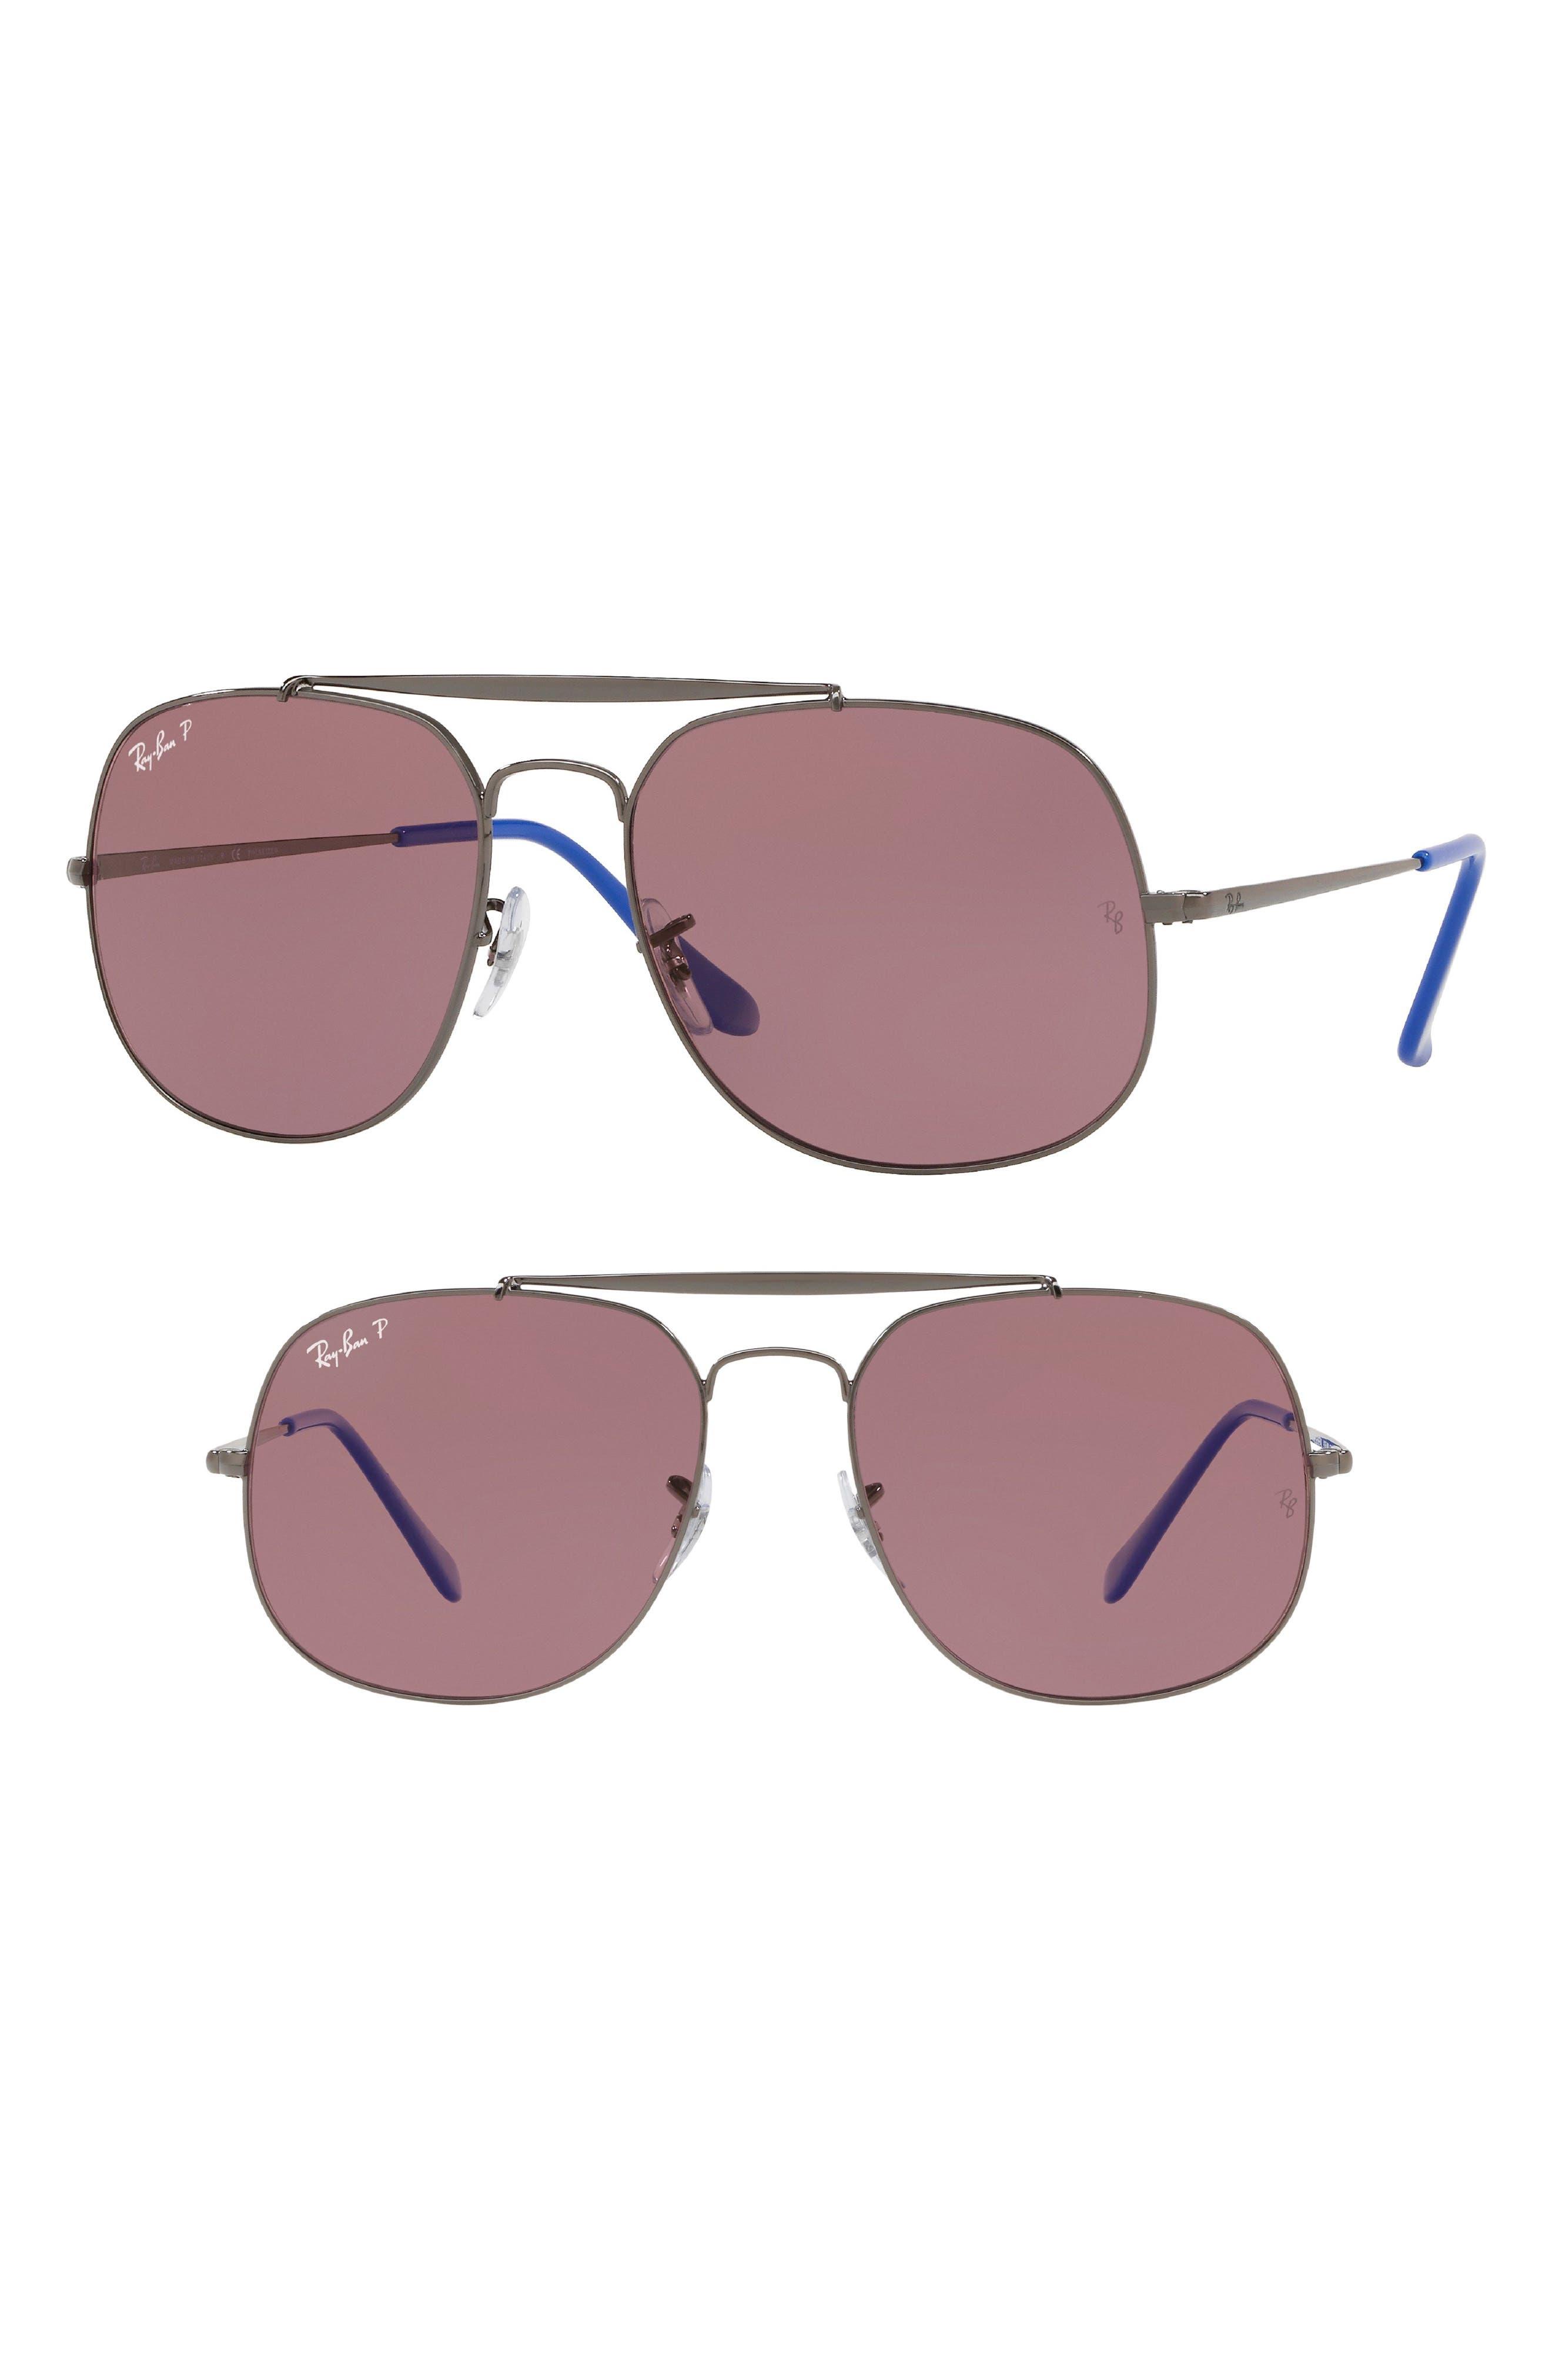 57mm Polarized Aviator Sunglasses,                             Main thumbnail 1, color,                             003